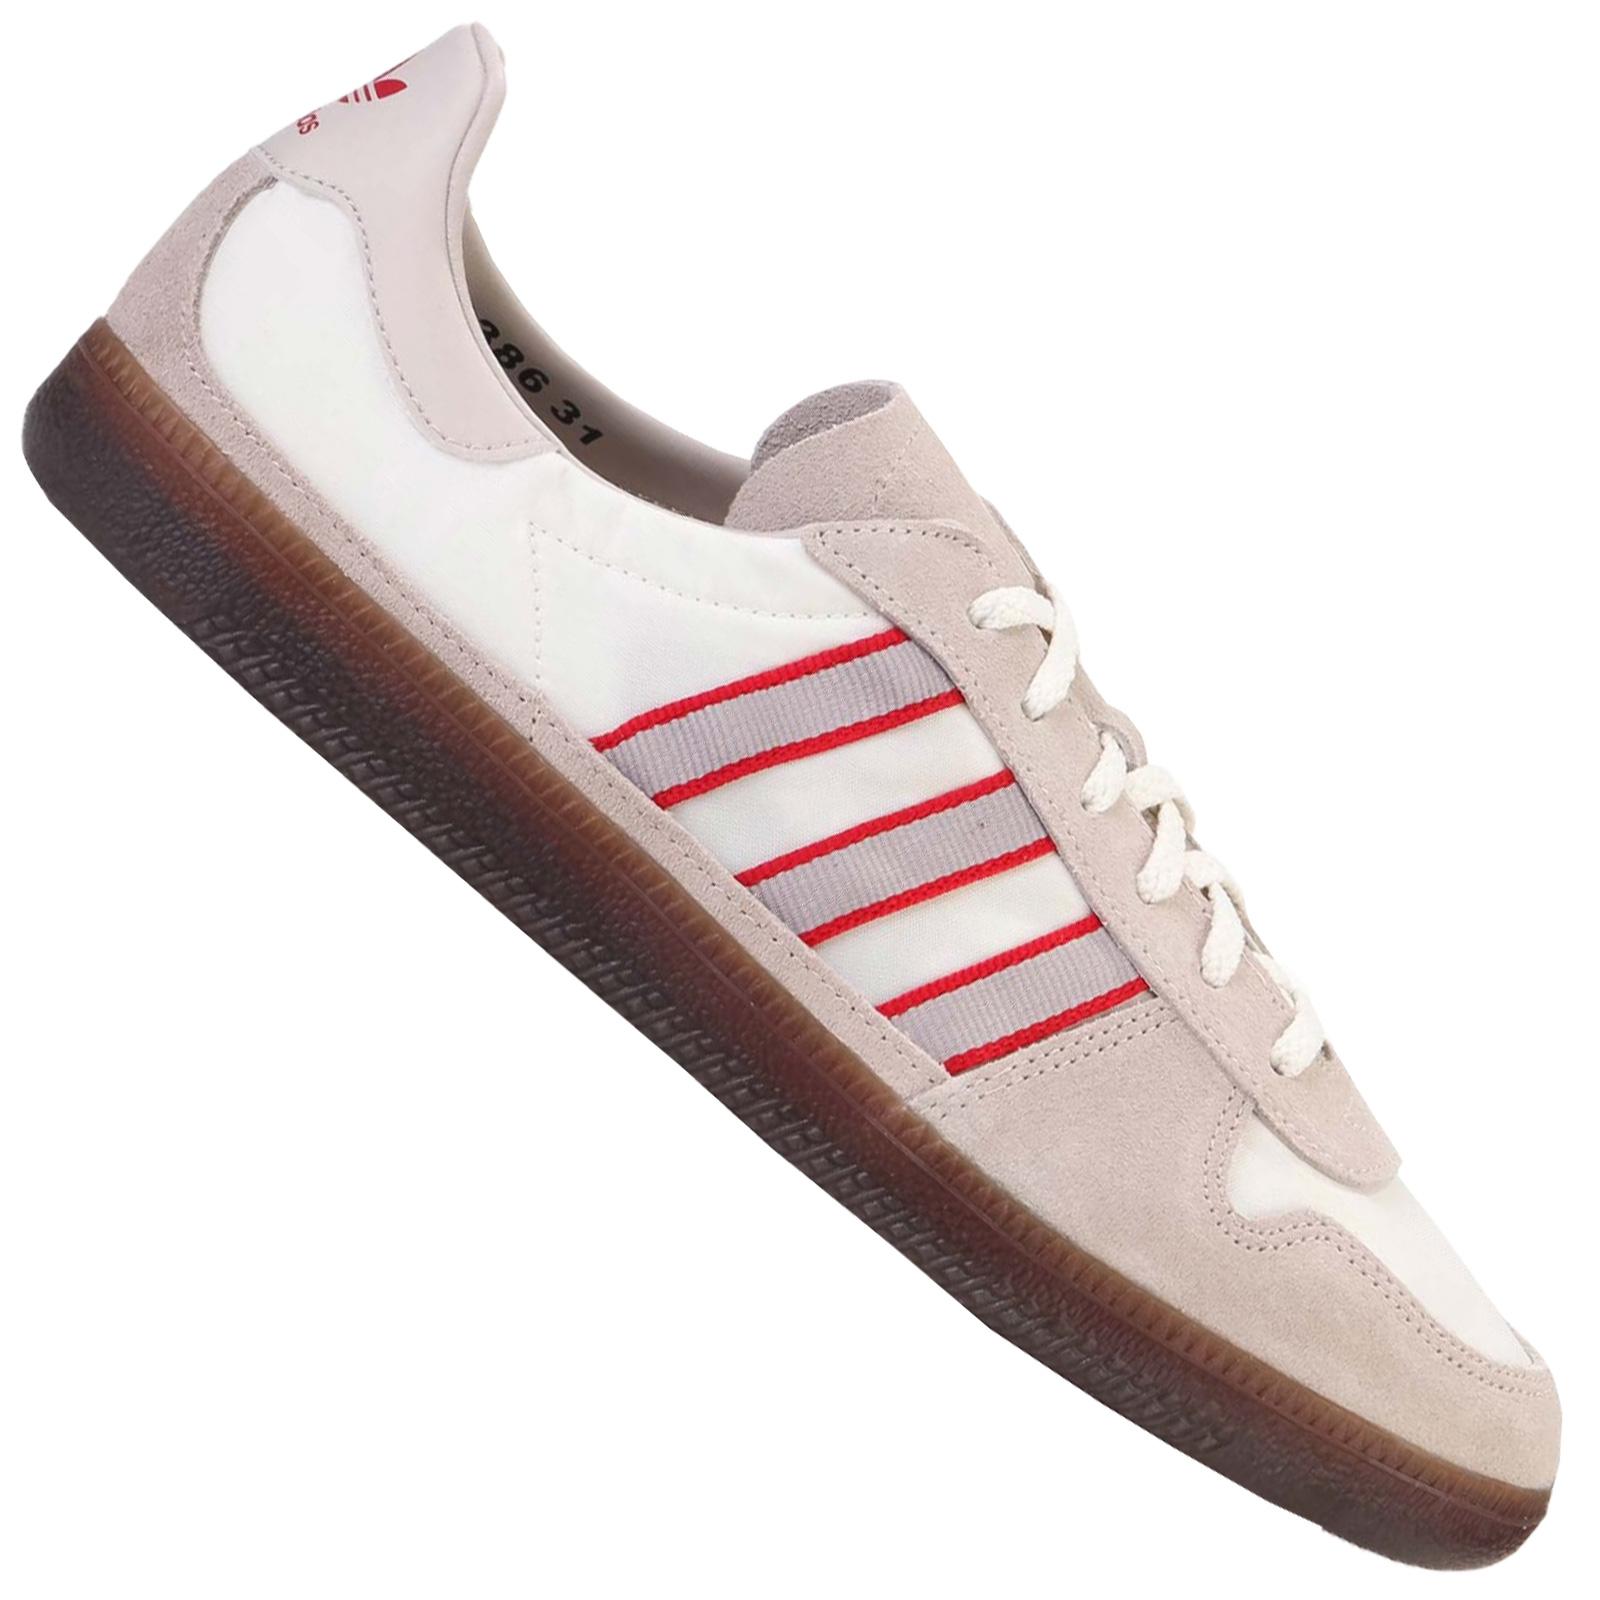 adidas schuh player retro weiss grau